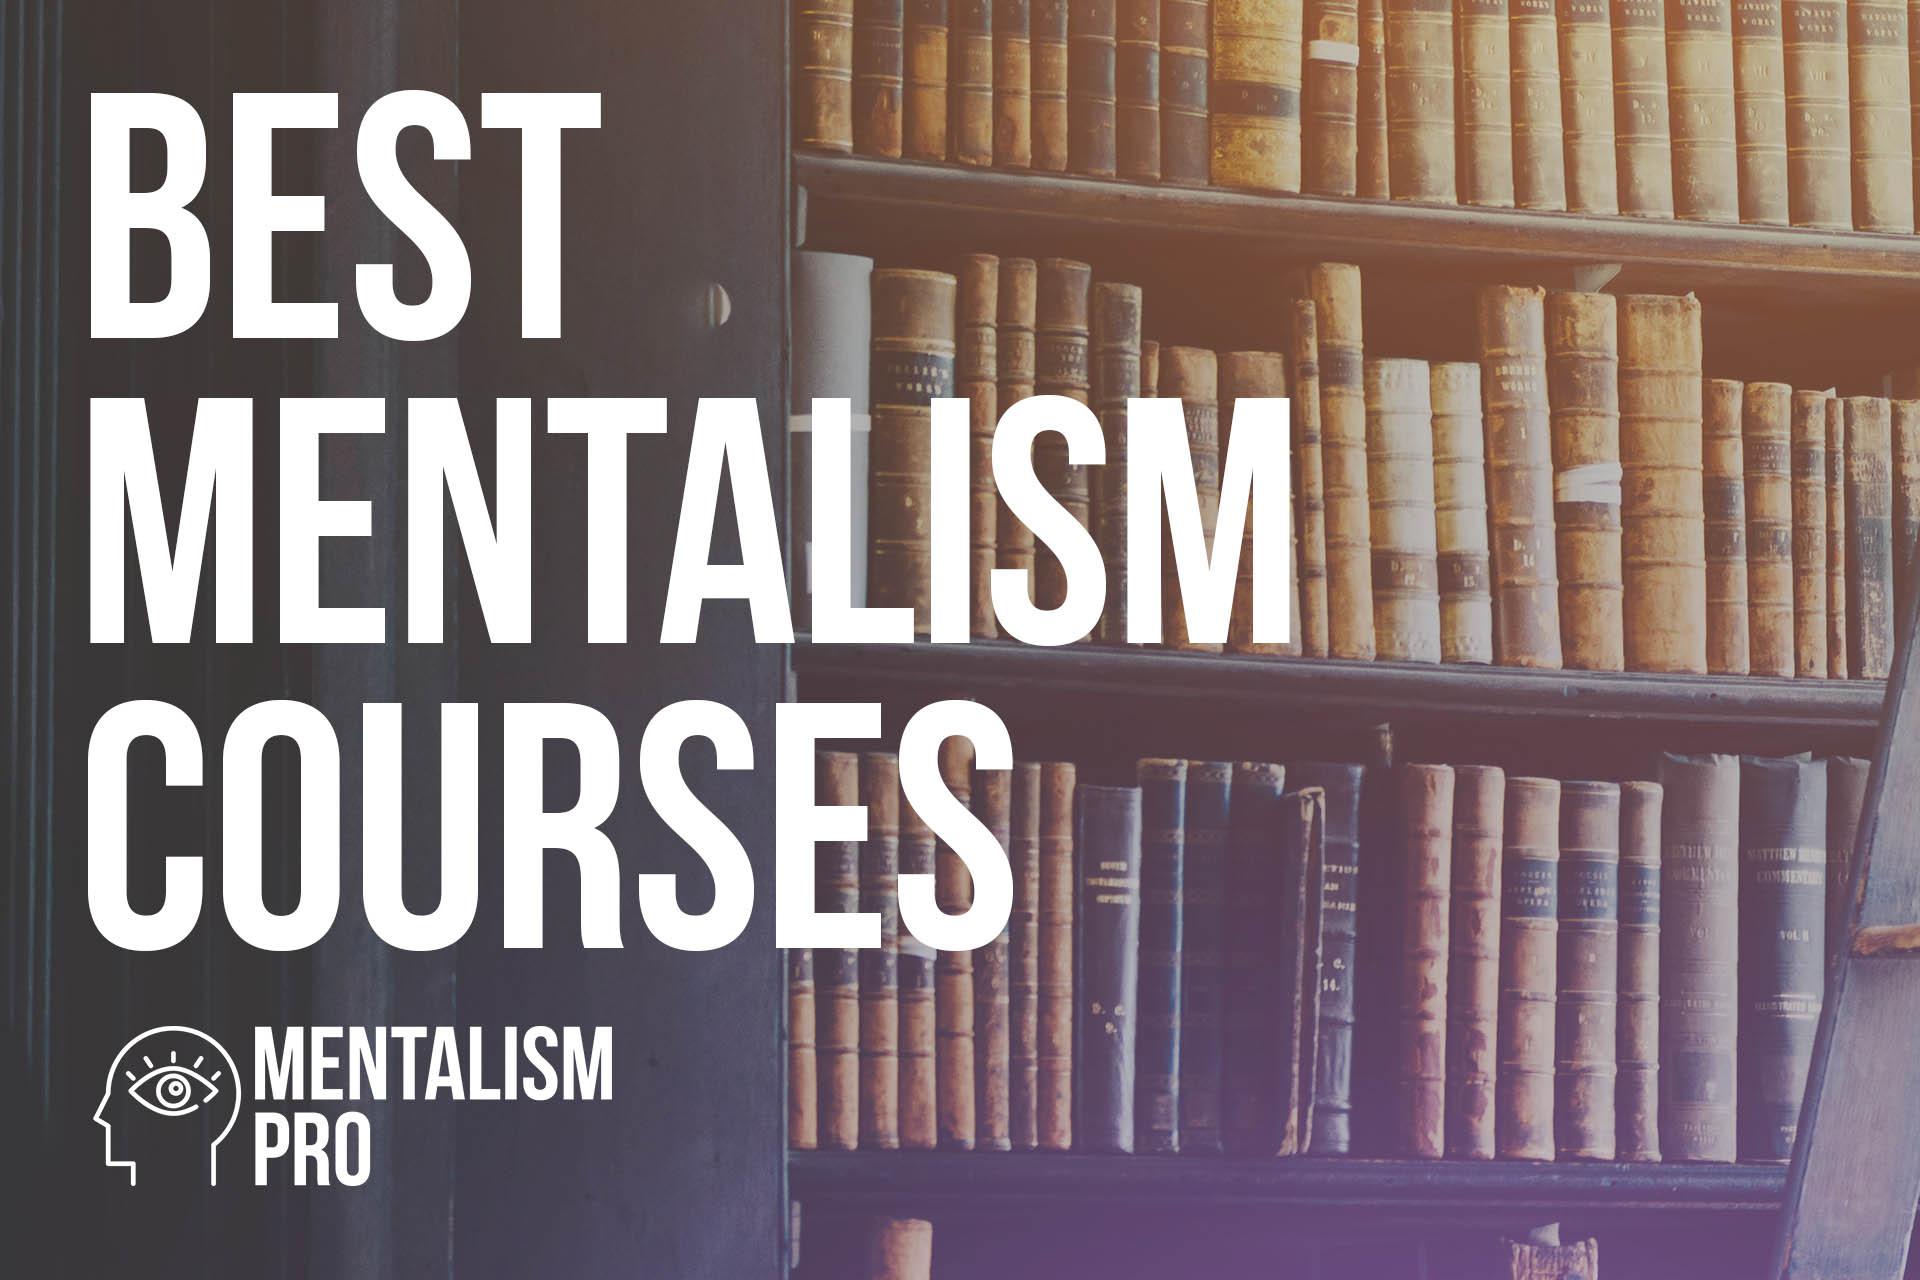 Top 3 Mentalism Courses - Reviews & Guide 2021 - MentalismPro